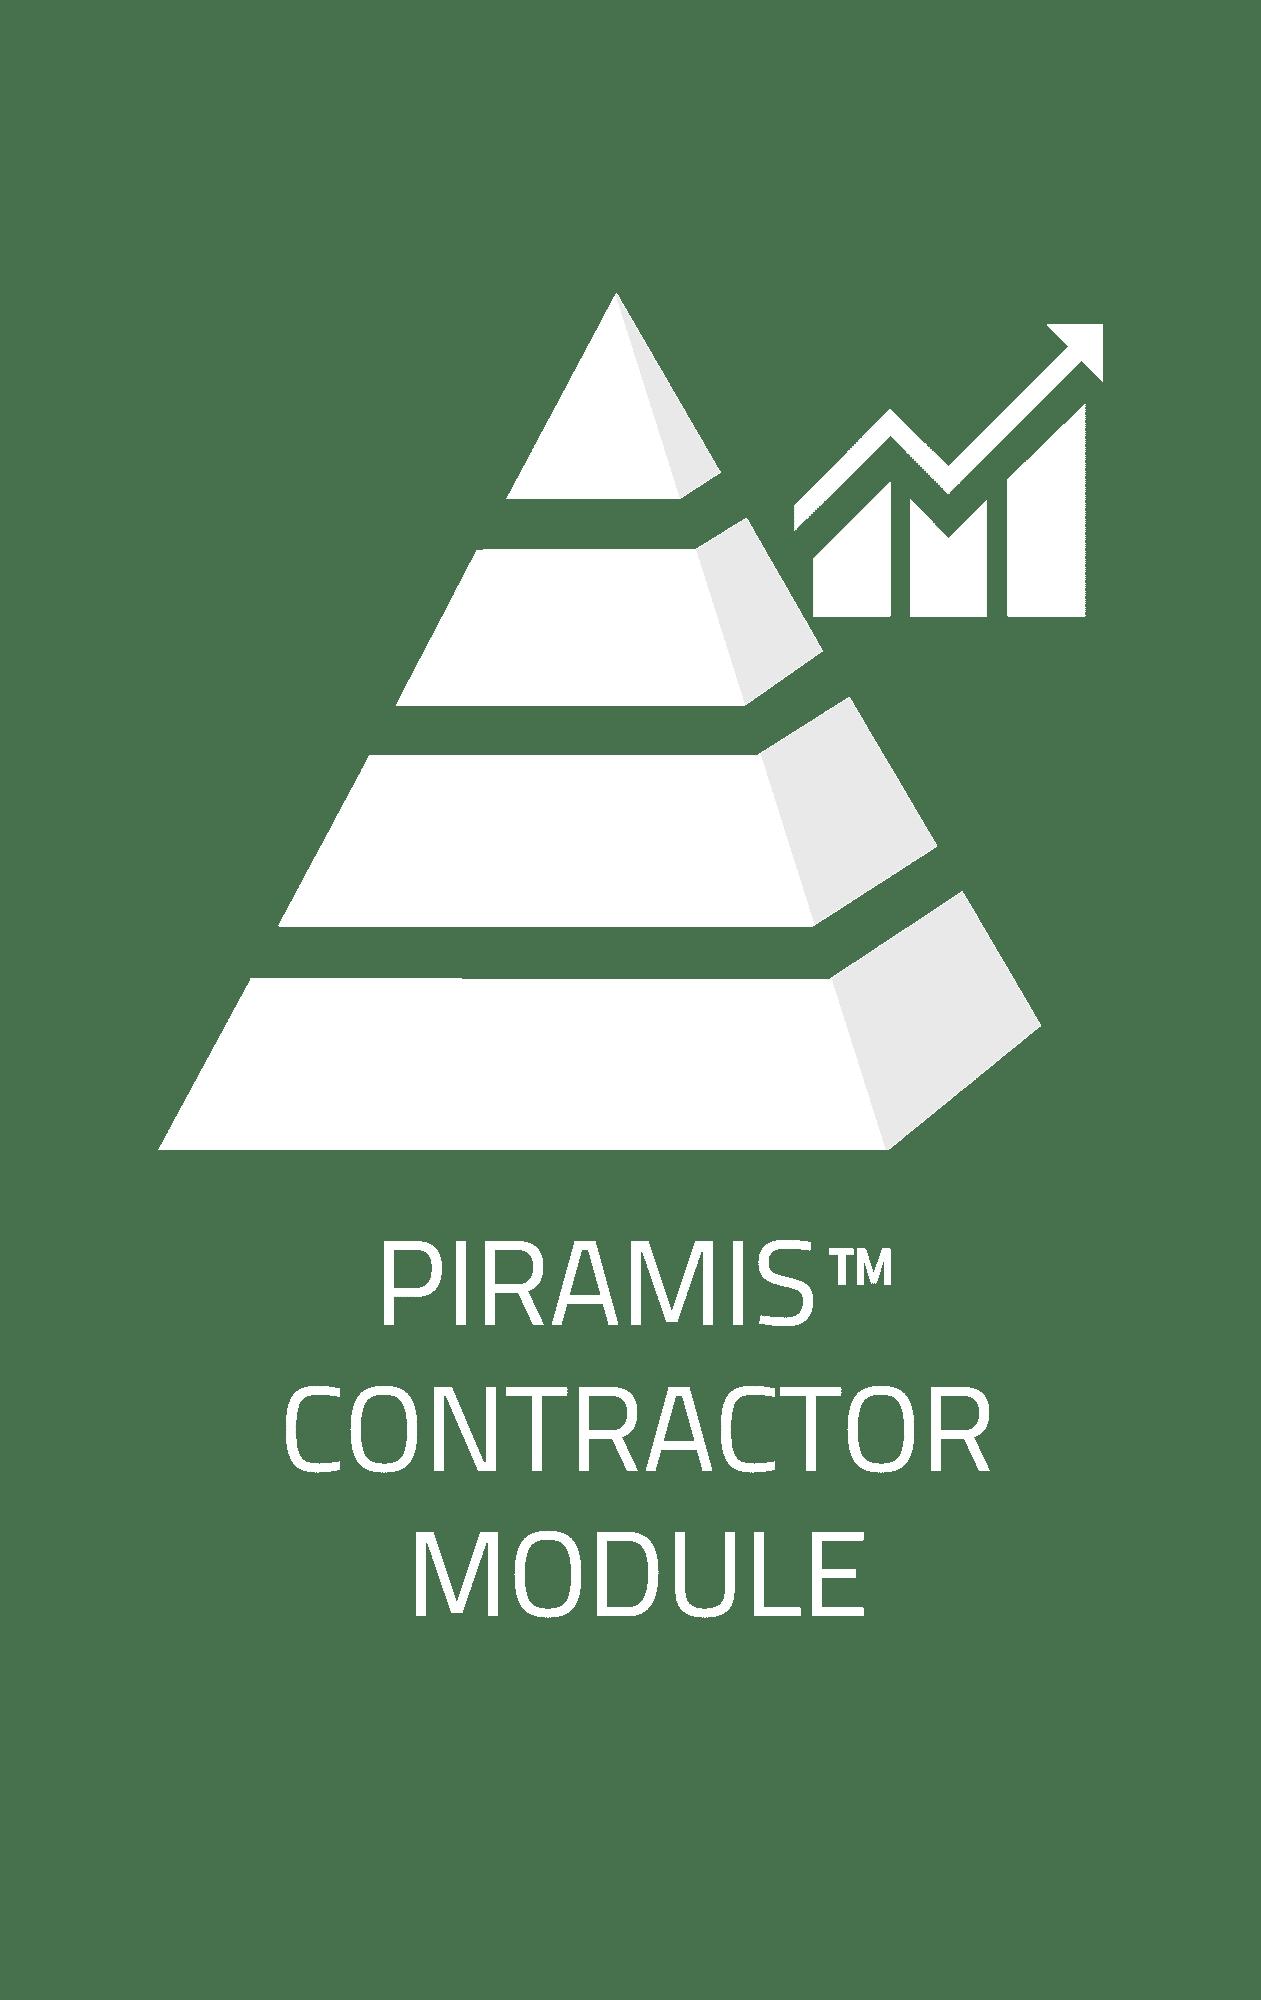 PIRAMIS™ Contractor Module